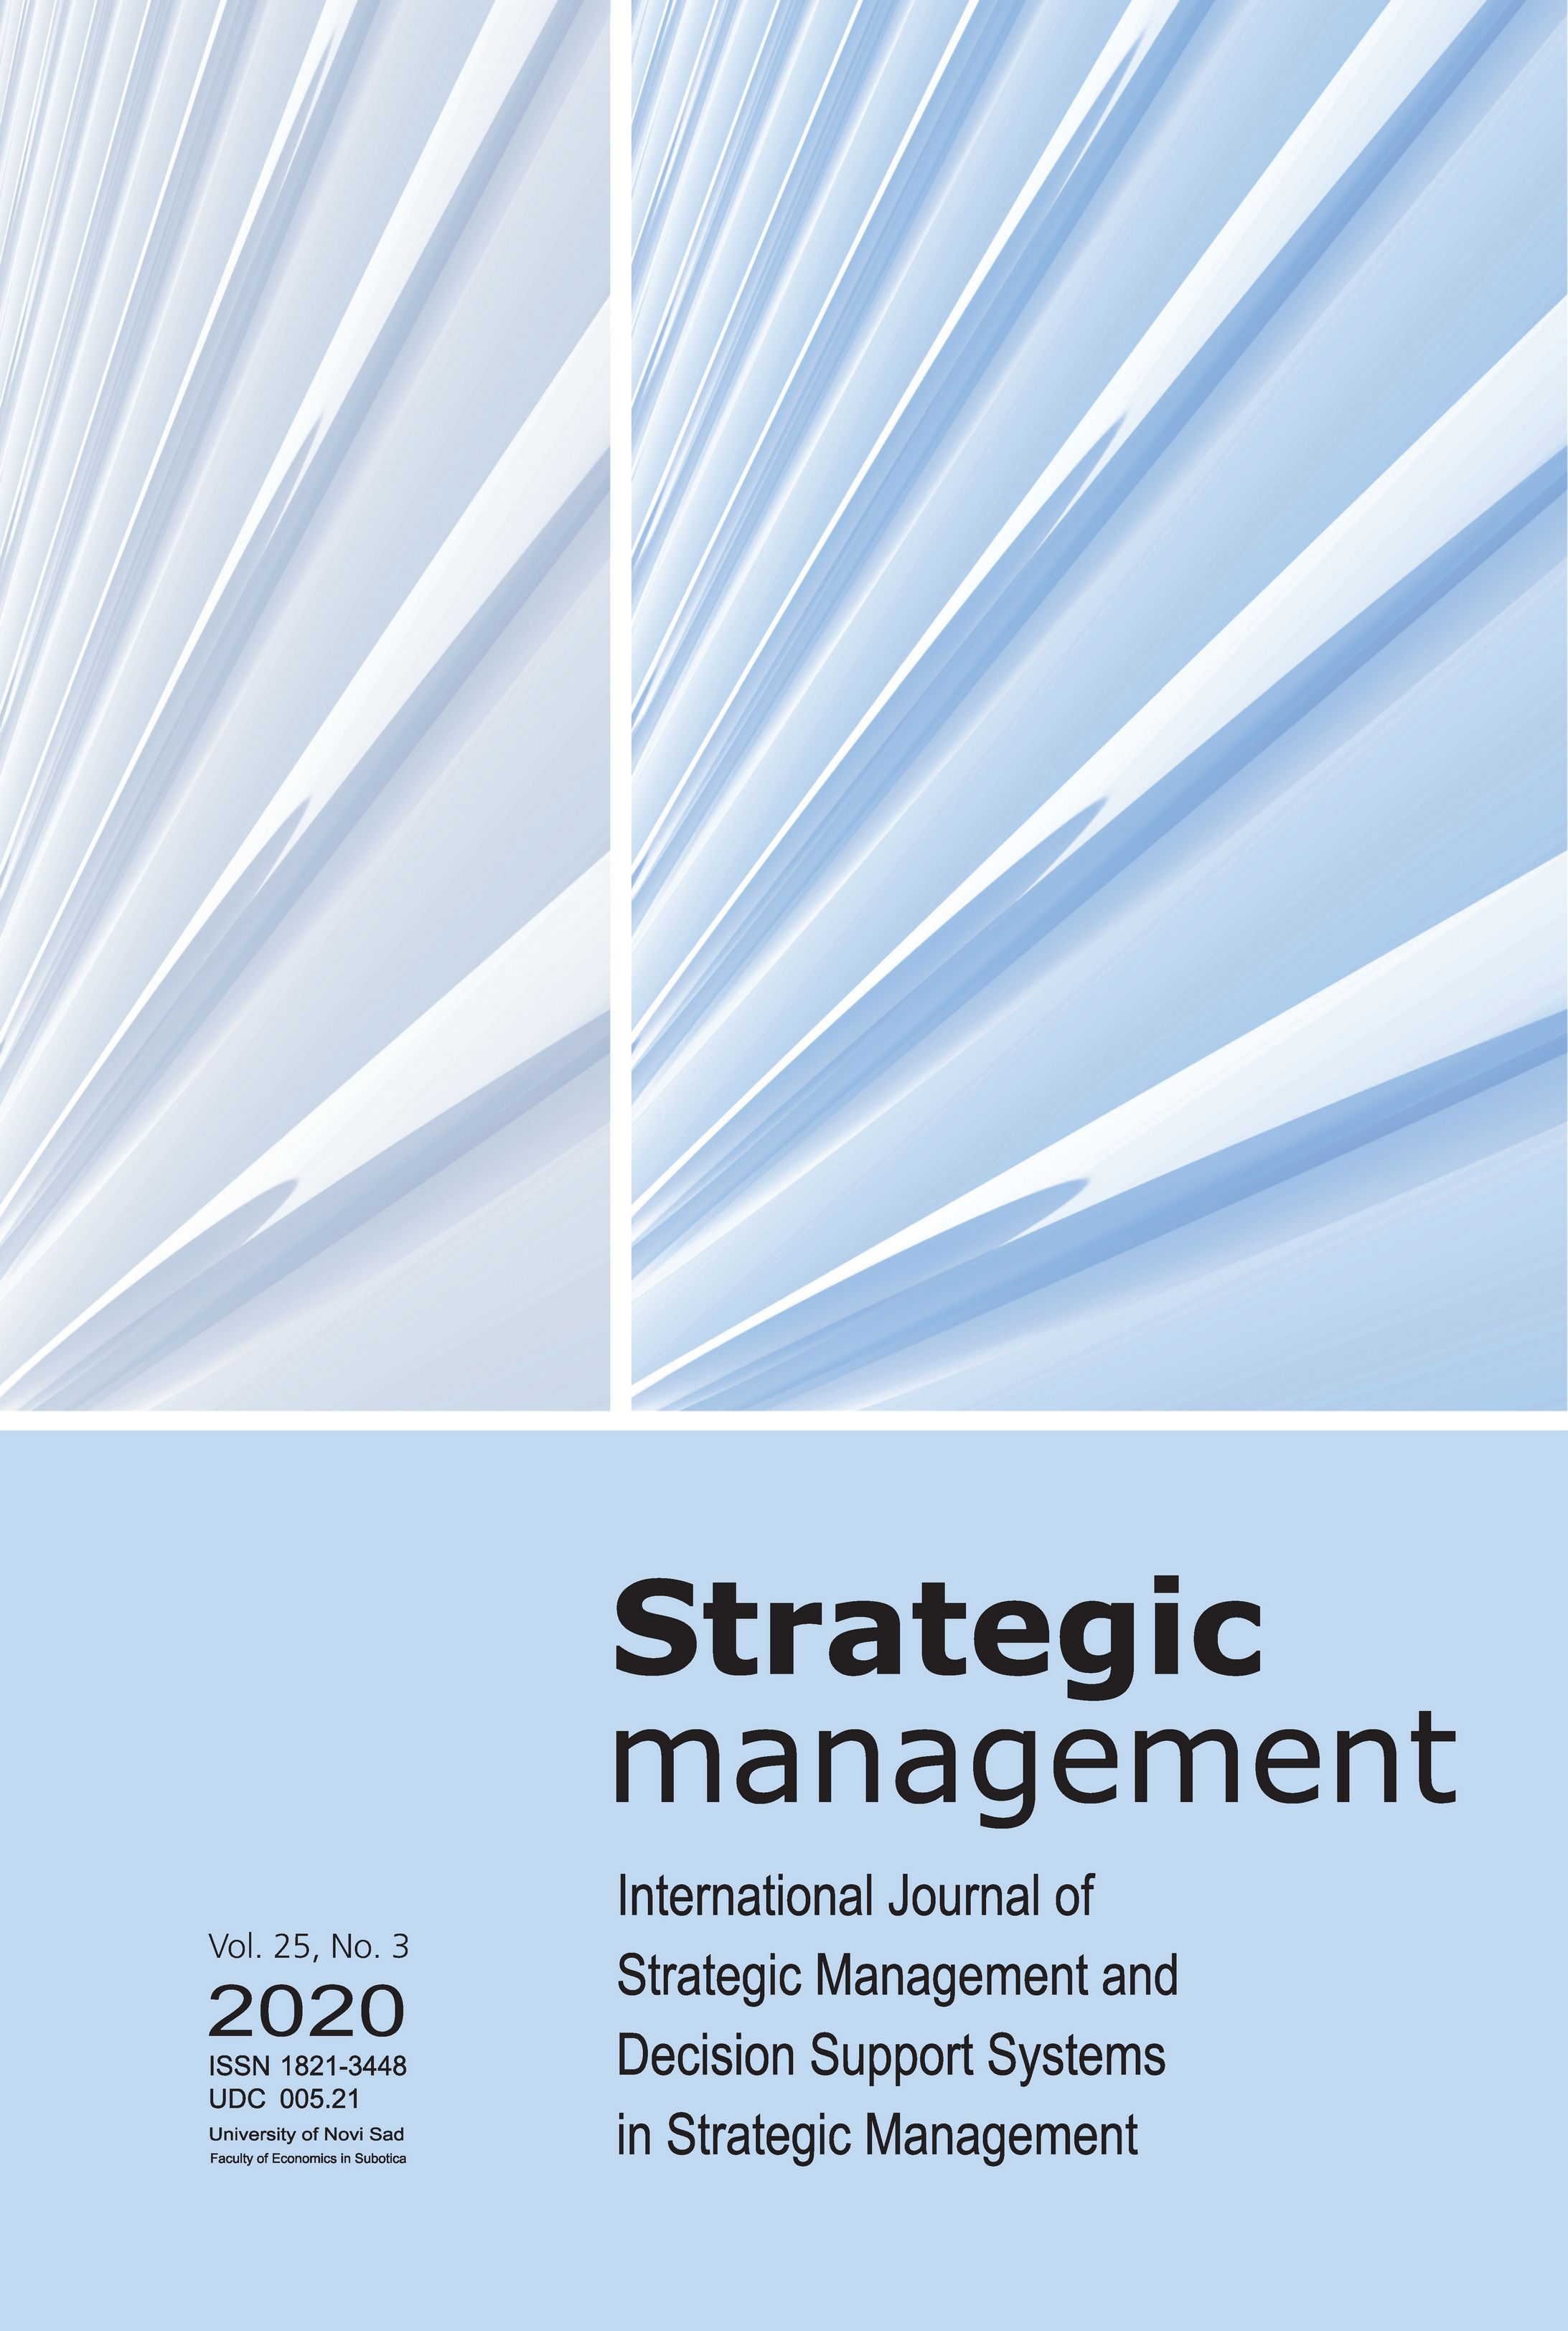 View Vol. 25 No. 3 (2020): Strategic Management